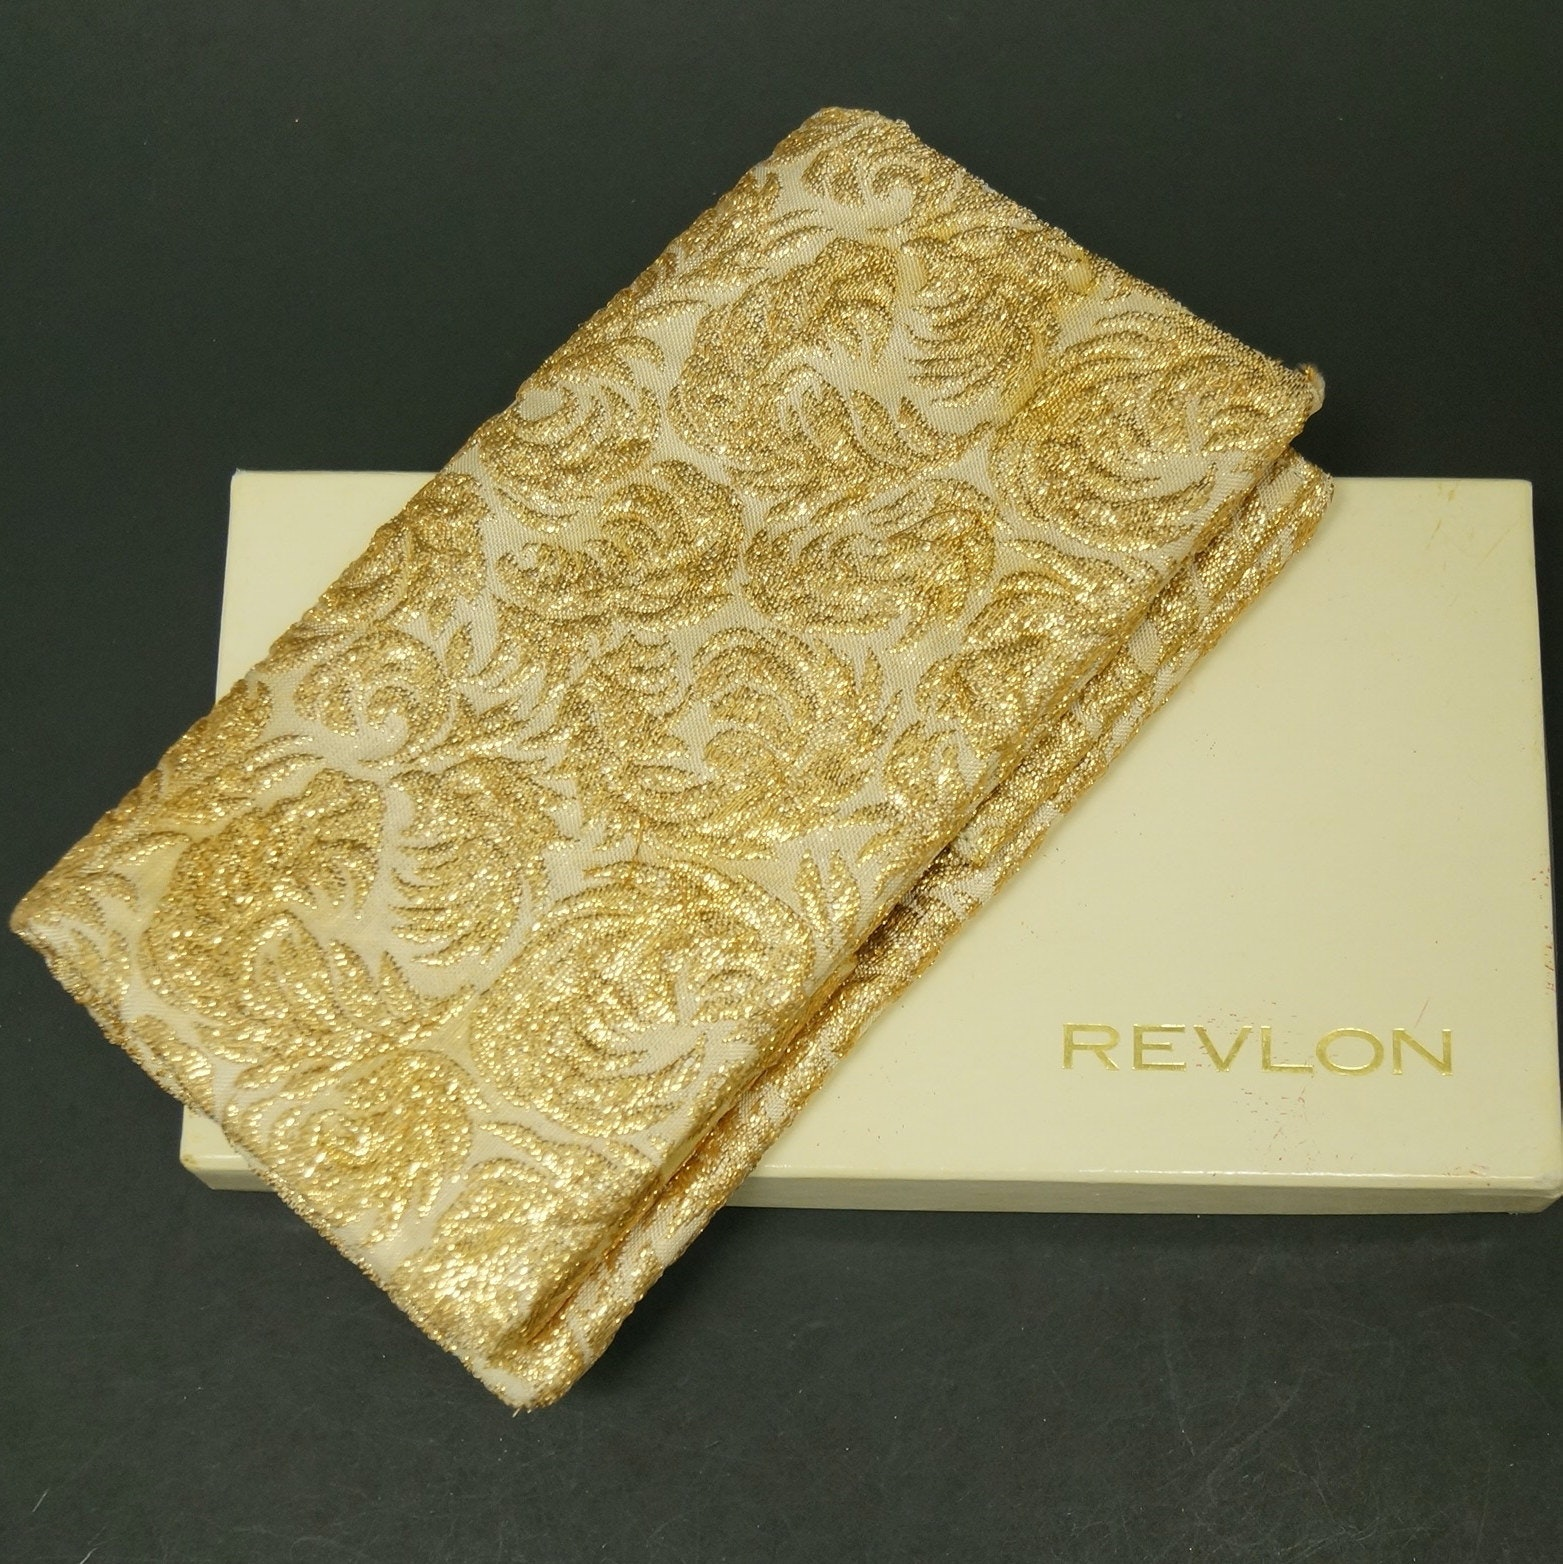 Circa 1960s Vintage Revlon Evening Clutch with Compact Case